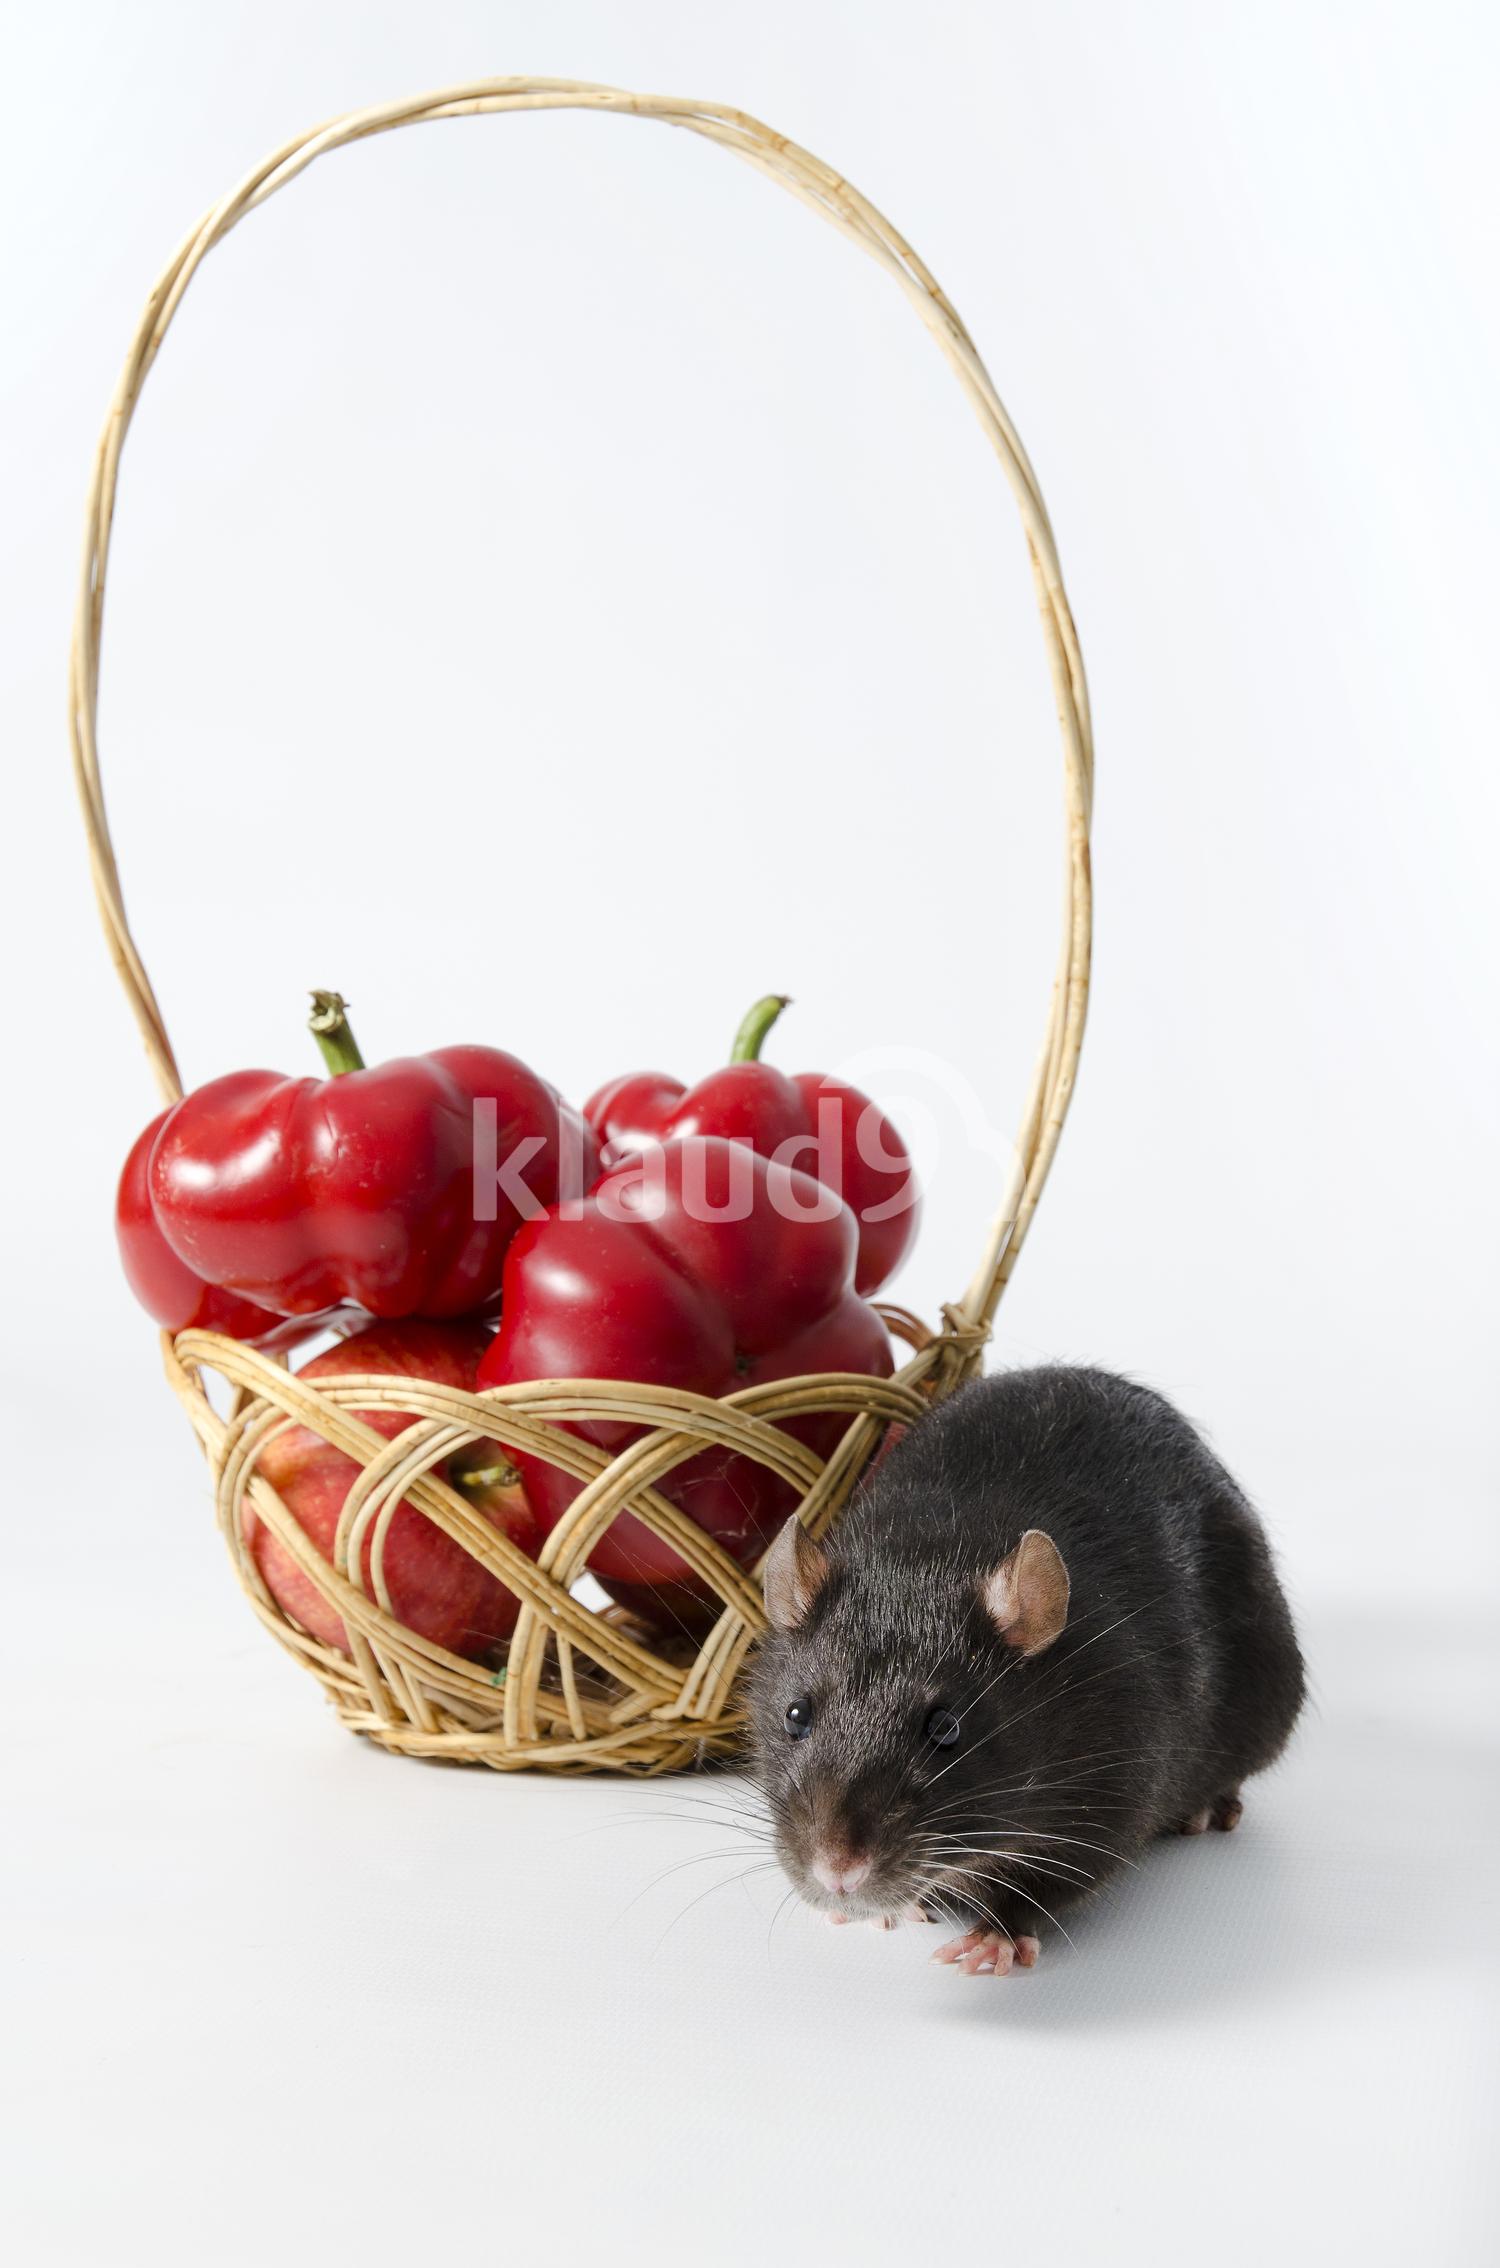 Black Rat with Wicker basket